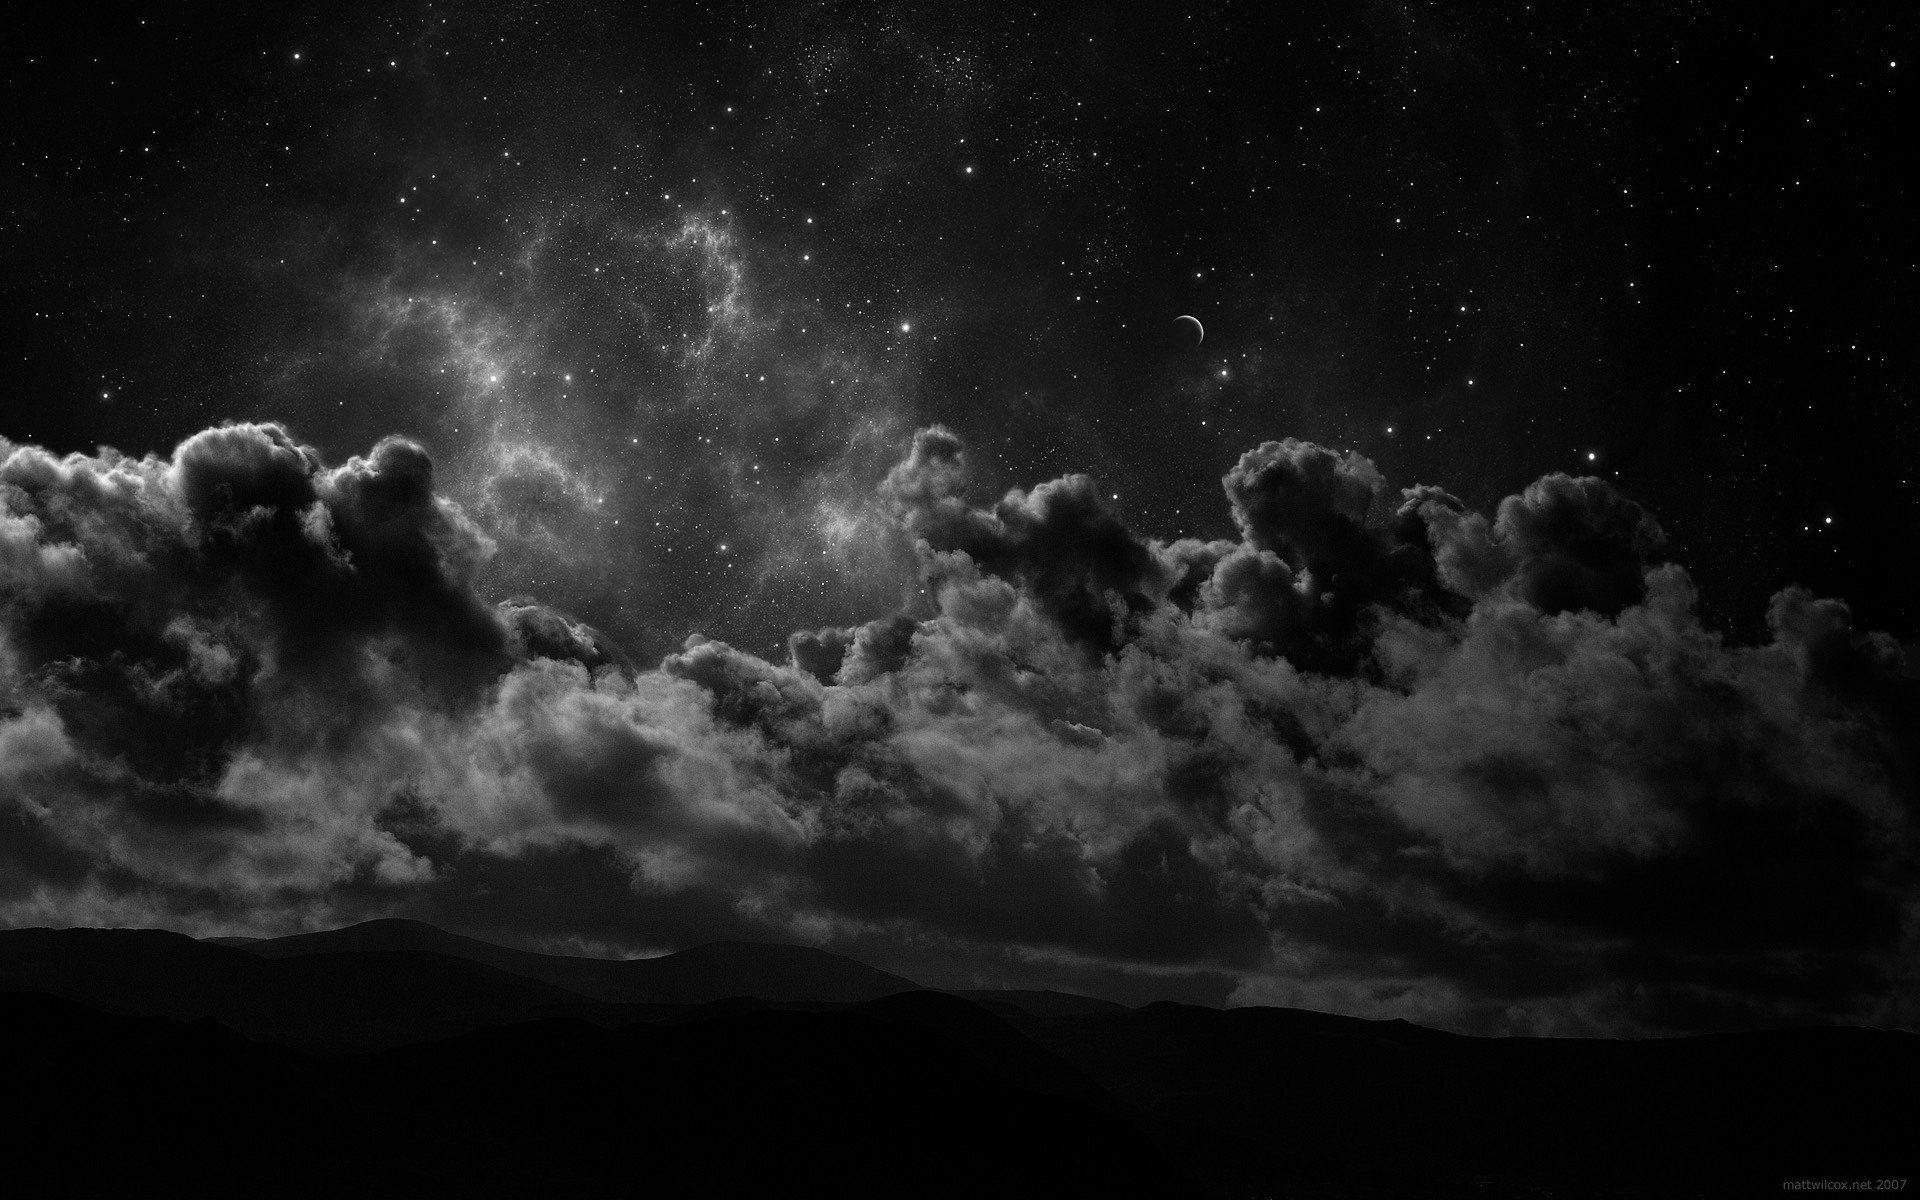 774703cloudsgrayscalenightstars.jpg (1920×1200) Full